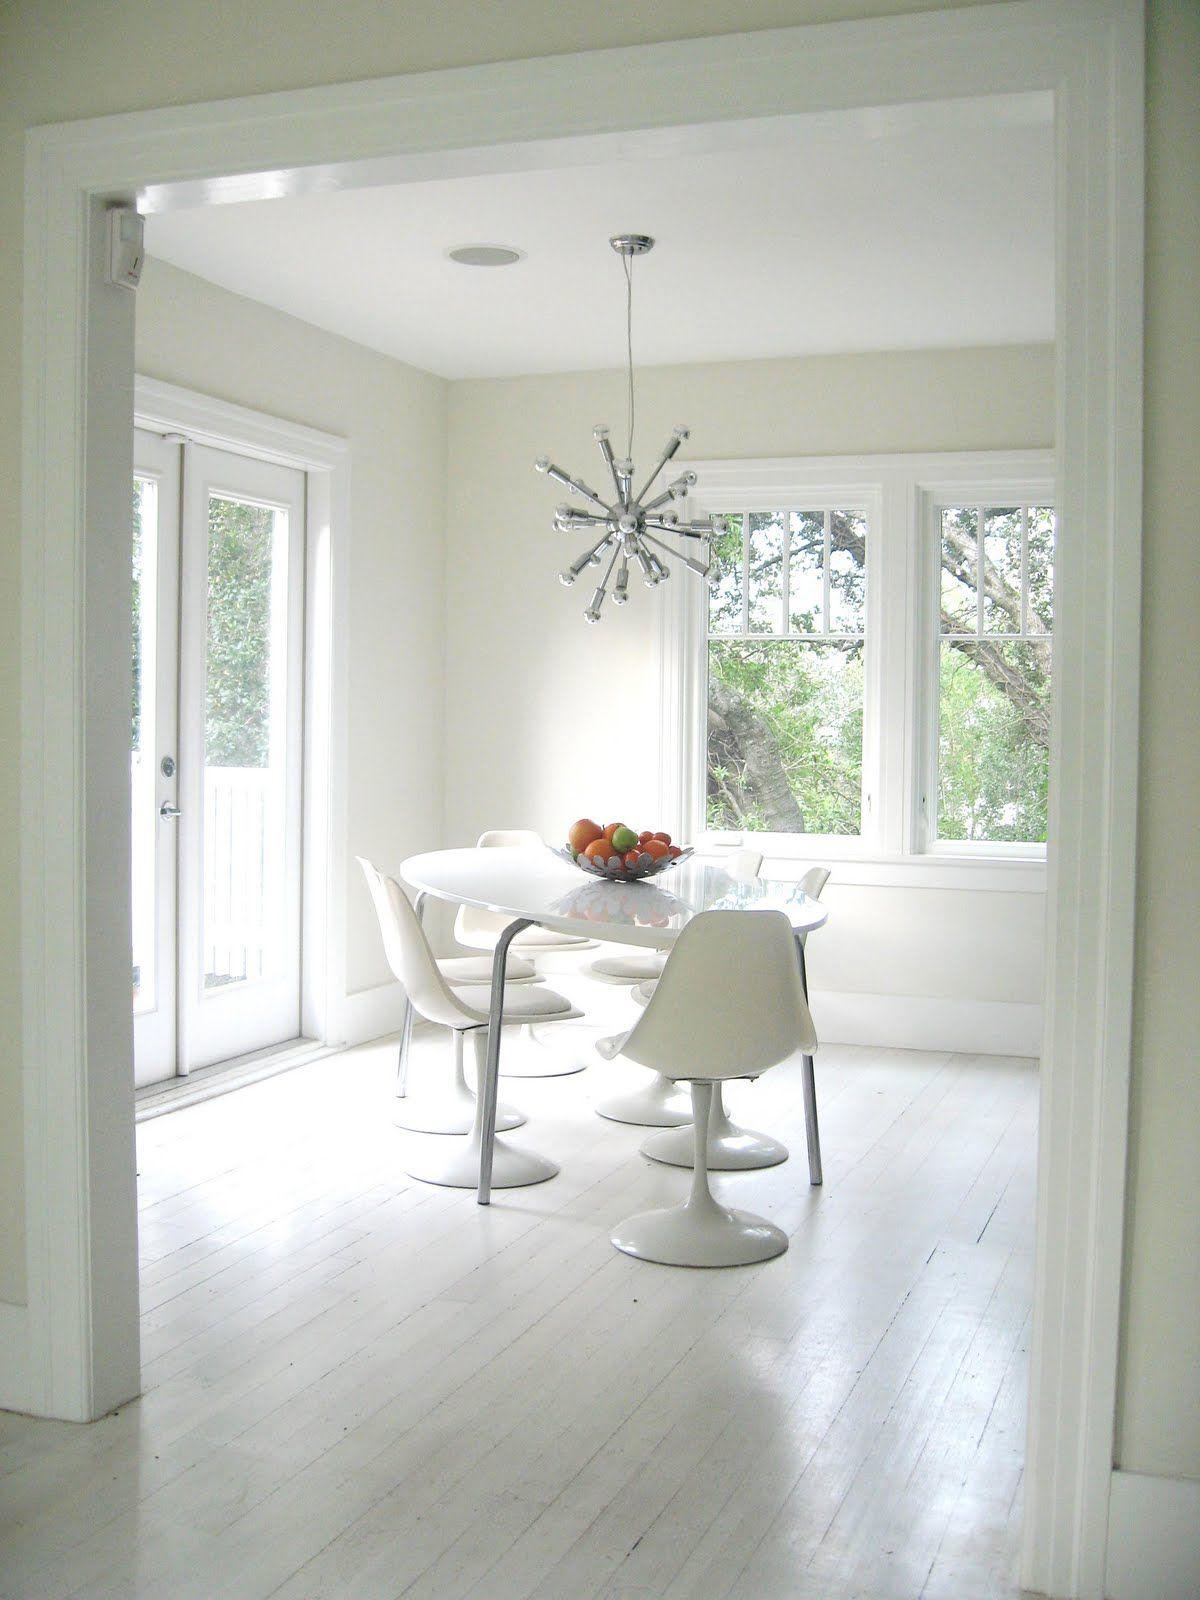 zero waste home kitchen home minimalism interior waste free living on zero waste kitchen interior id=22790